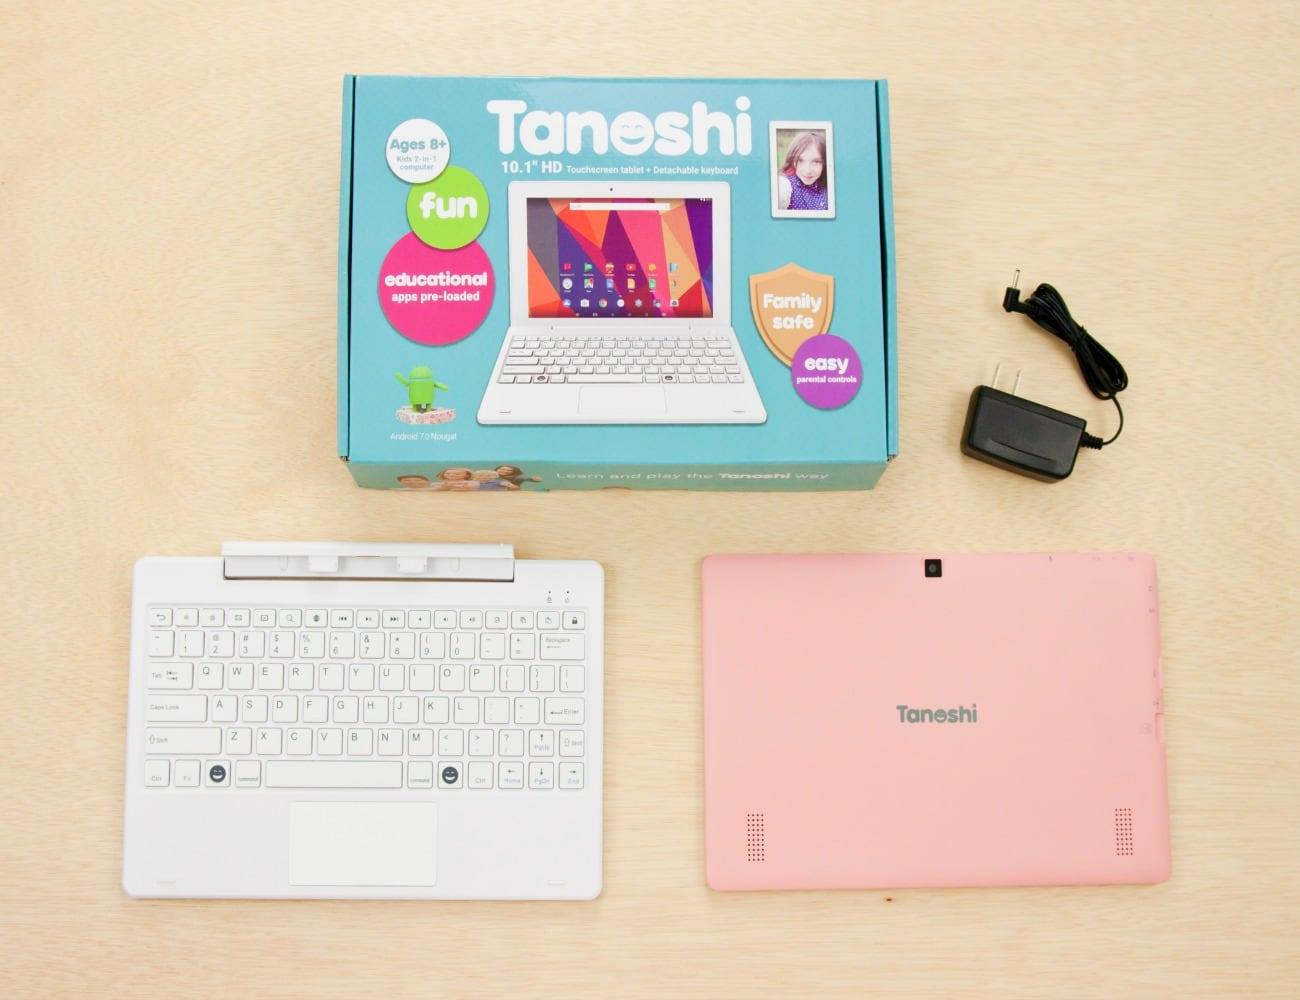 Tanoshi 2-in-1 Kids Computer